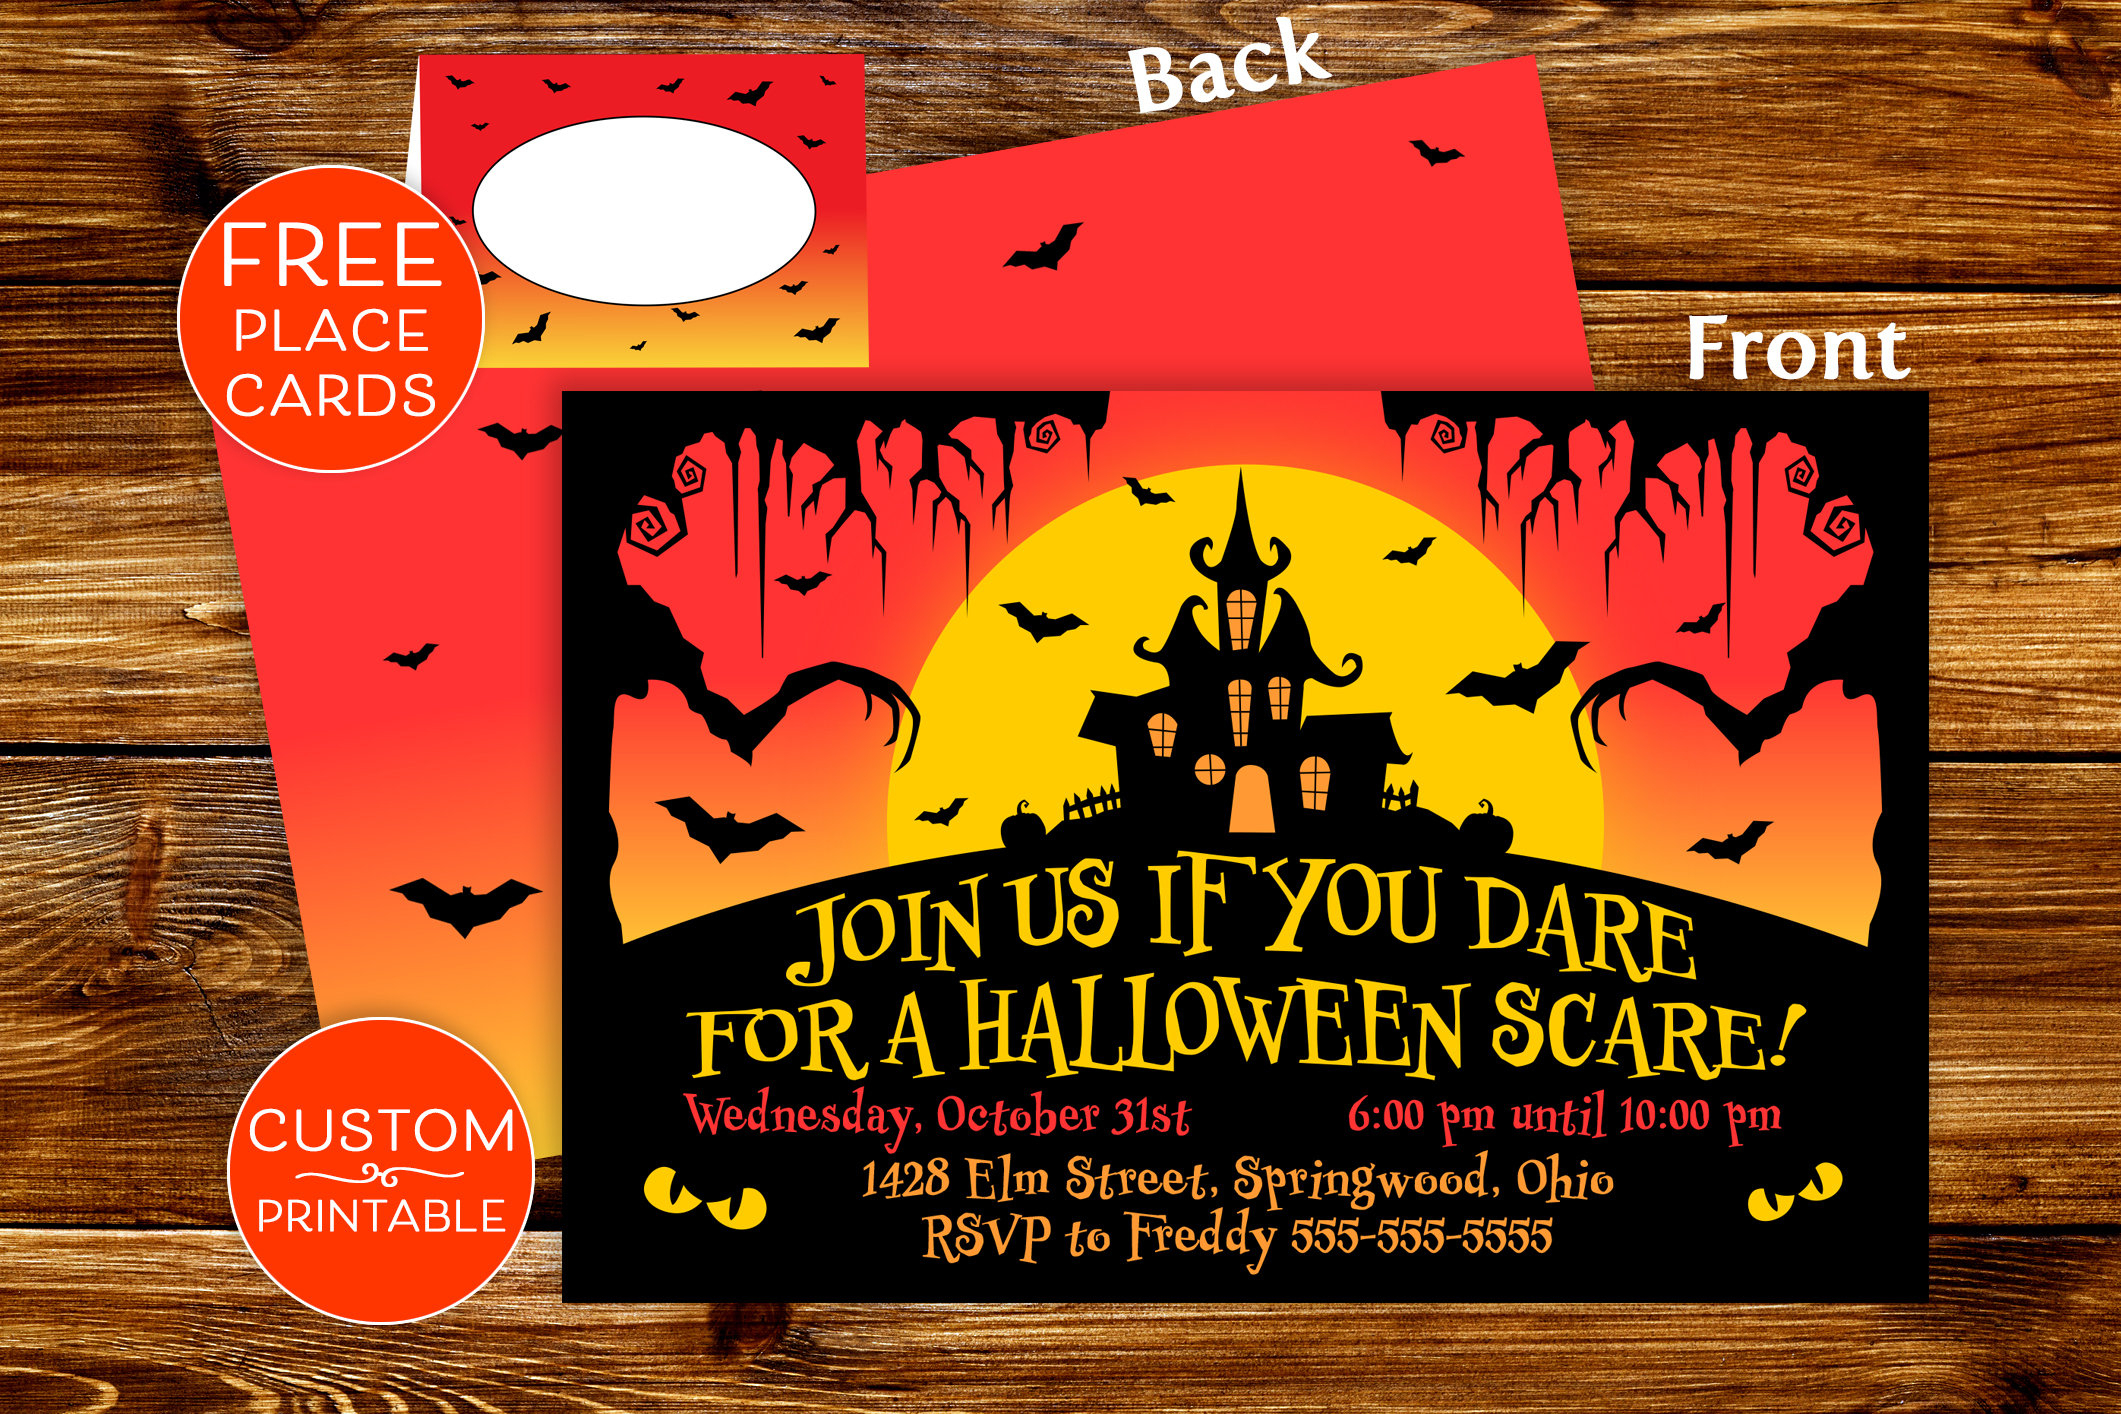 Printable Halloween Party Invitations Spooky Invite Custom | Etsy - Free Printable Halloween Place Cards